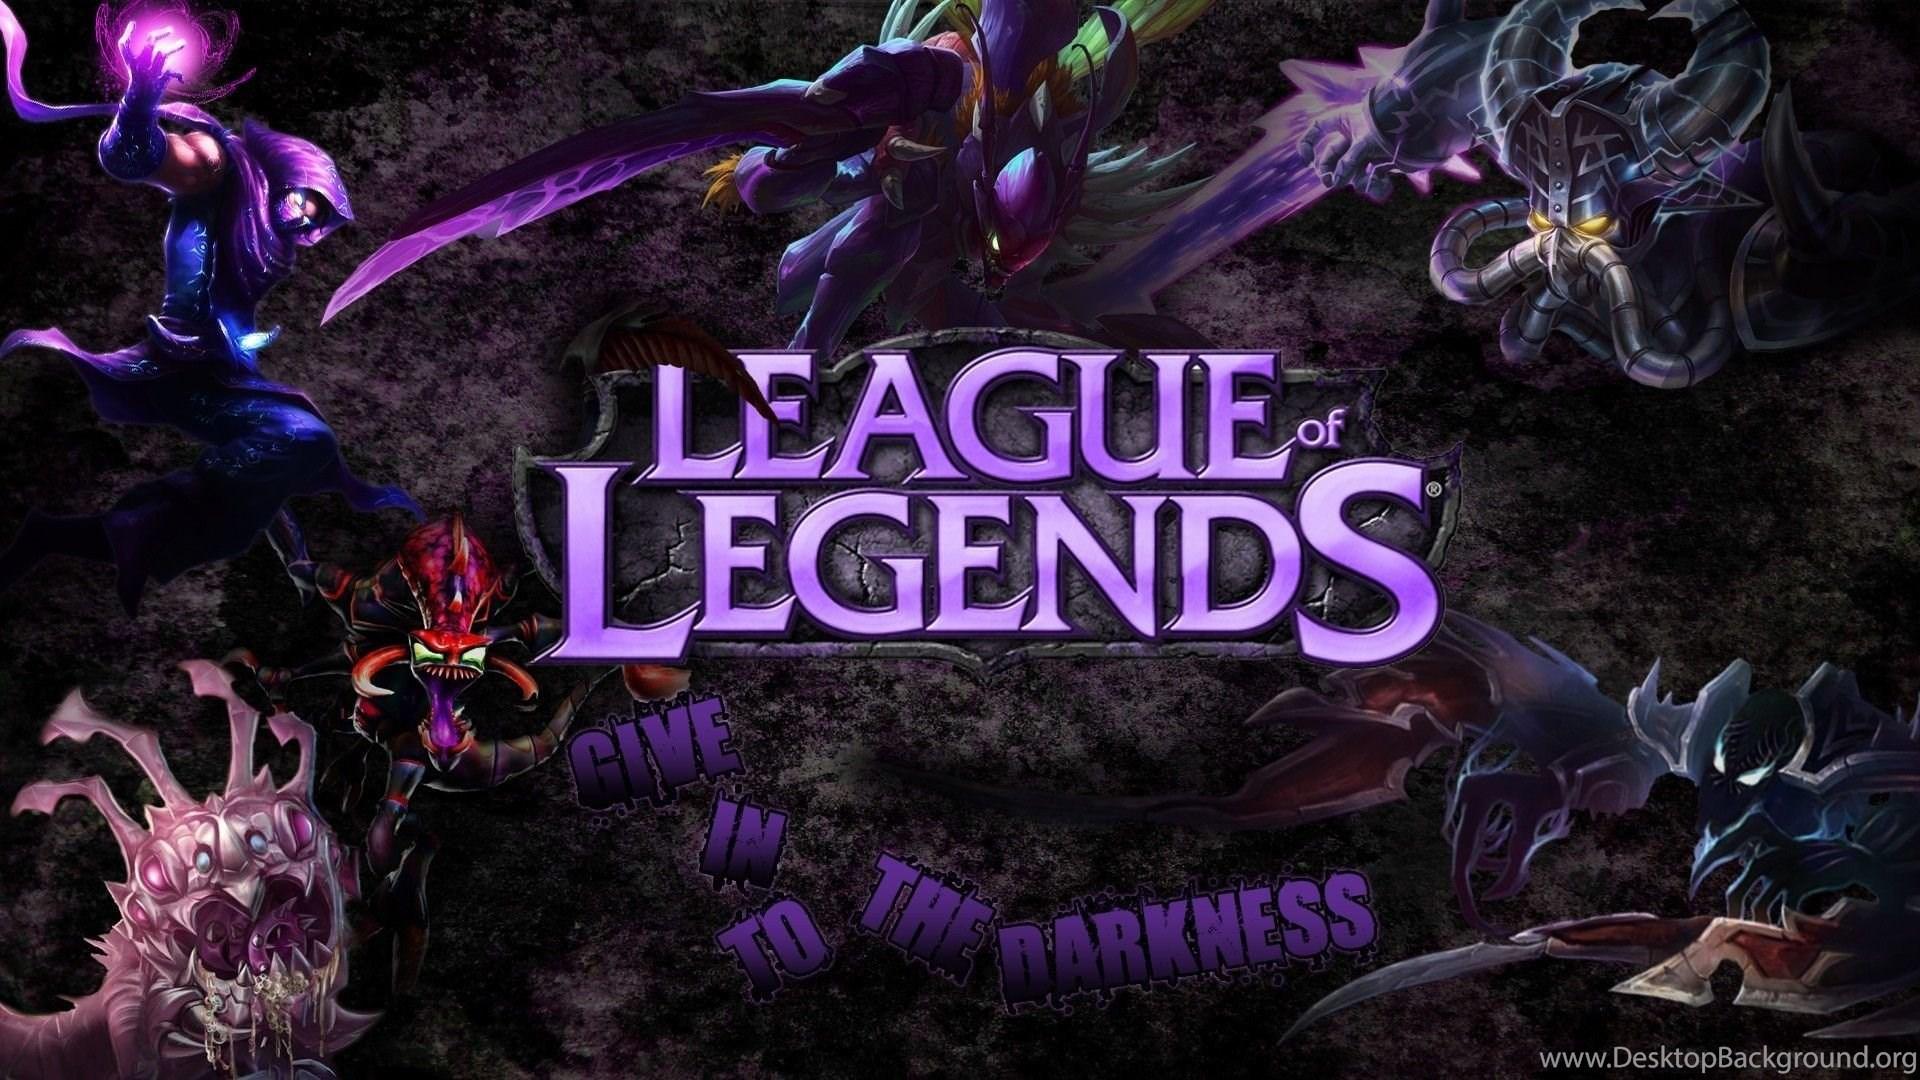 1280x1024 jax league of legends wallpapers desktop background league of legends wallpaperg voltagebd Image collections